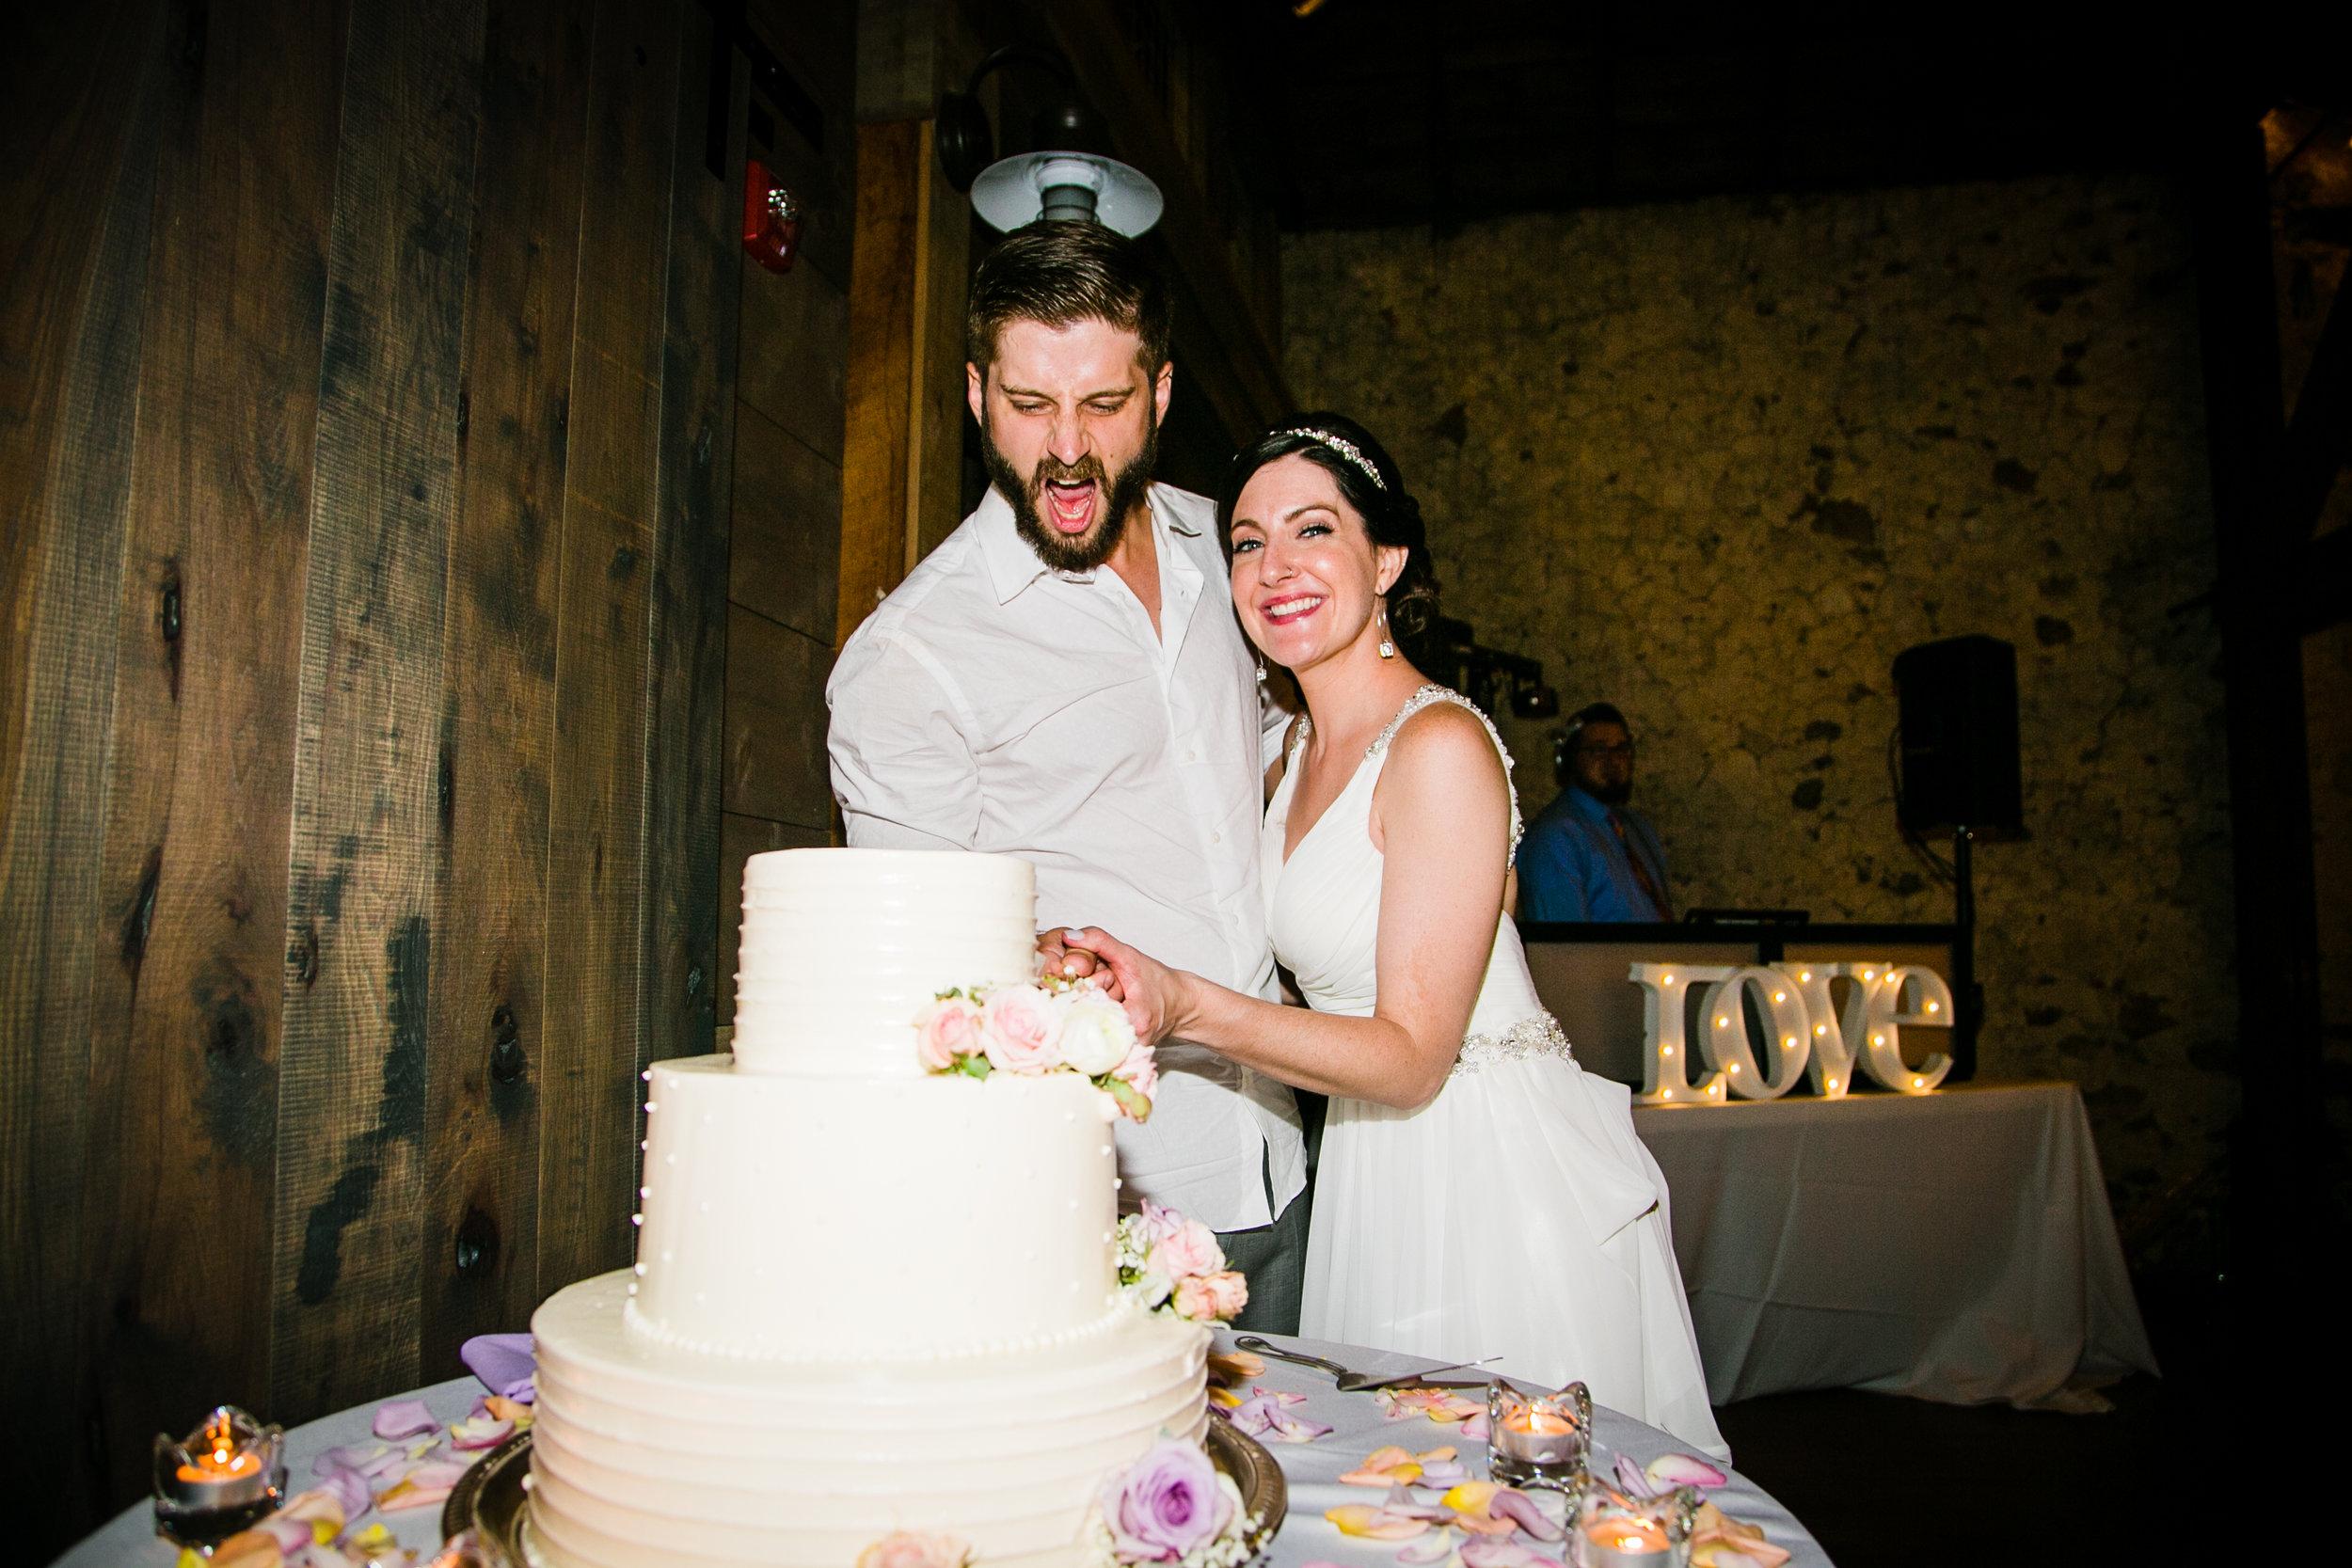 TYLER ARBORETUM WEDDING PHOTOGRAPHY LOVESTRUCK PICTURES-098.jpg